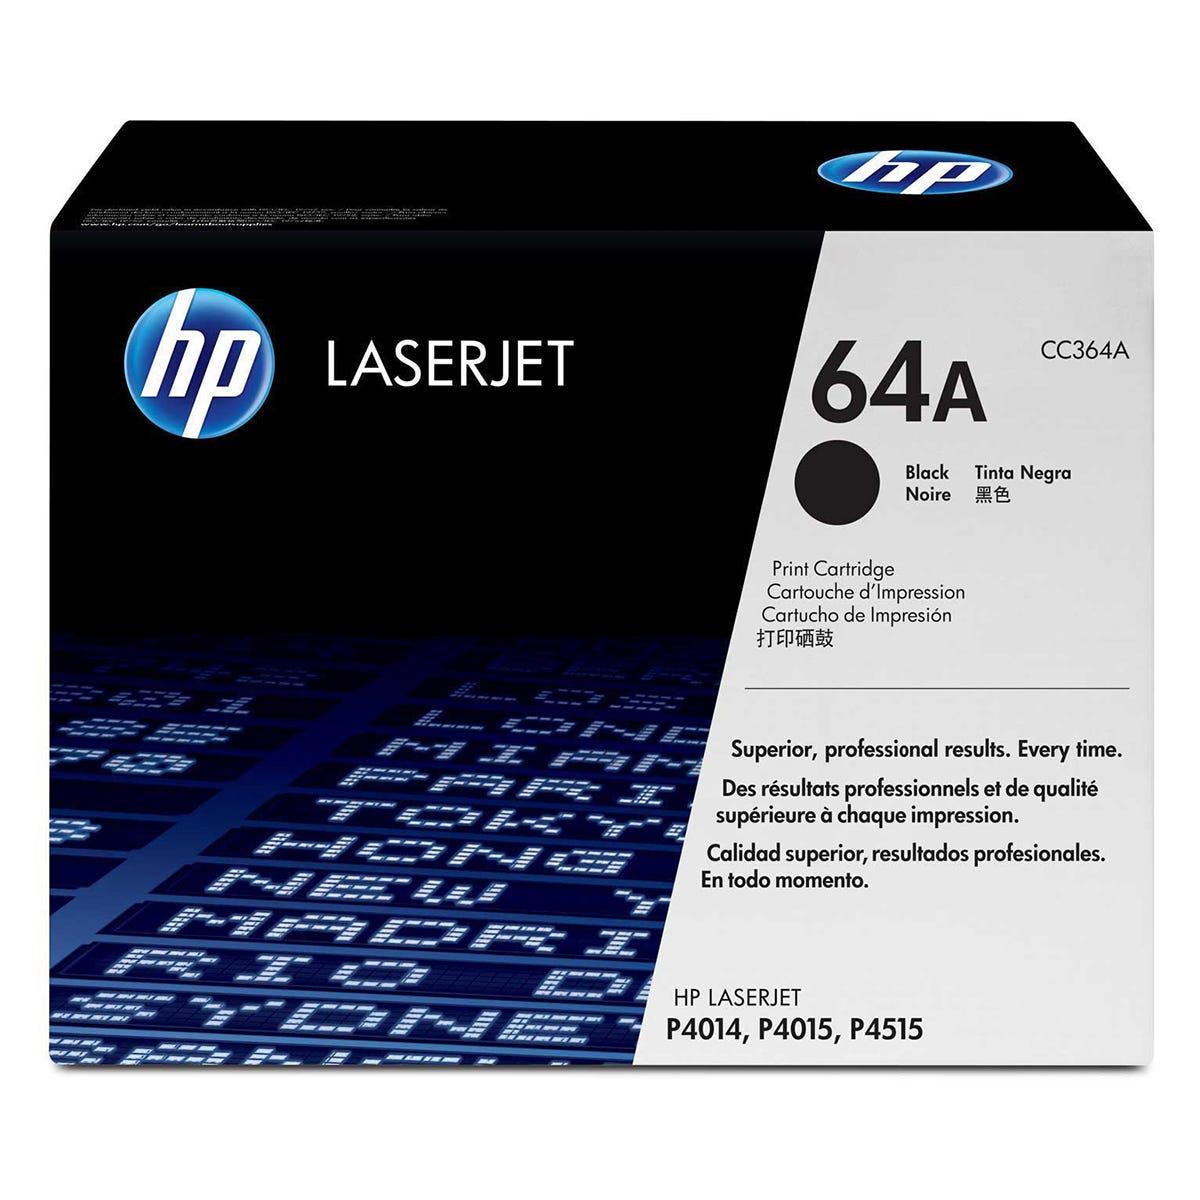 HP 64A Printer Ink Toner Cartridge CC364A, Black